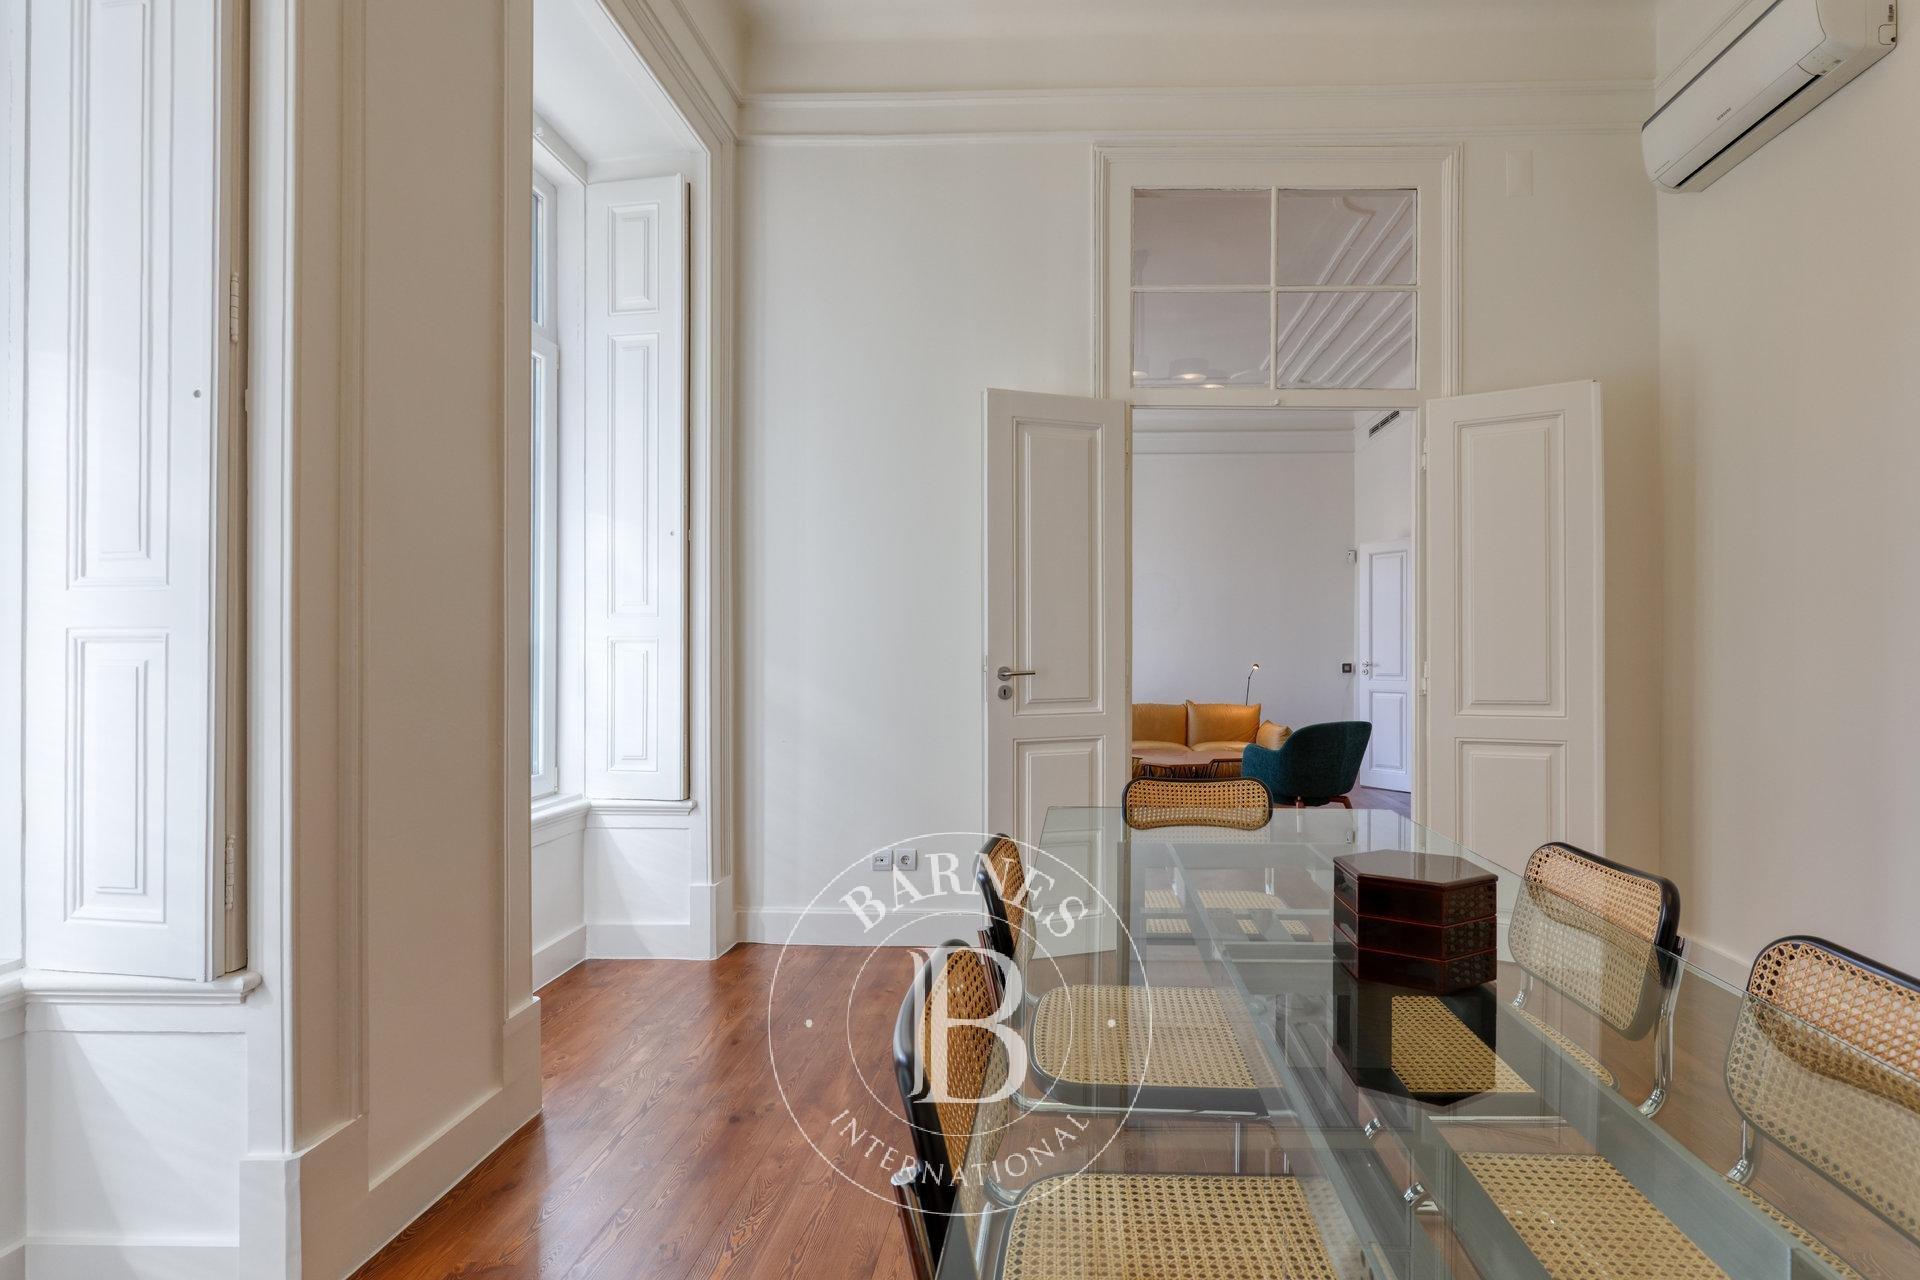 4-Bedroom apartment in Rato